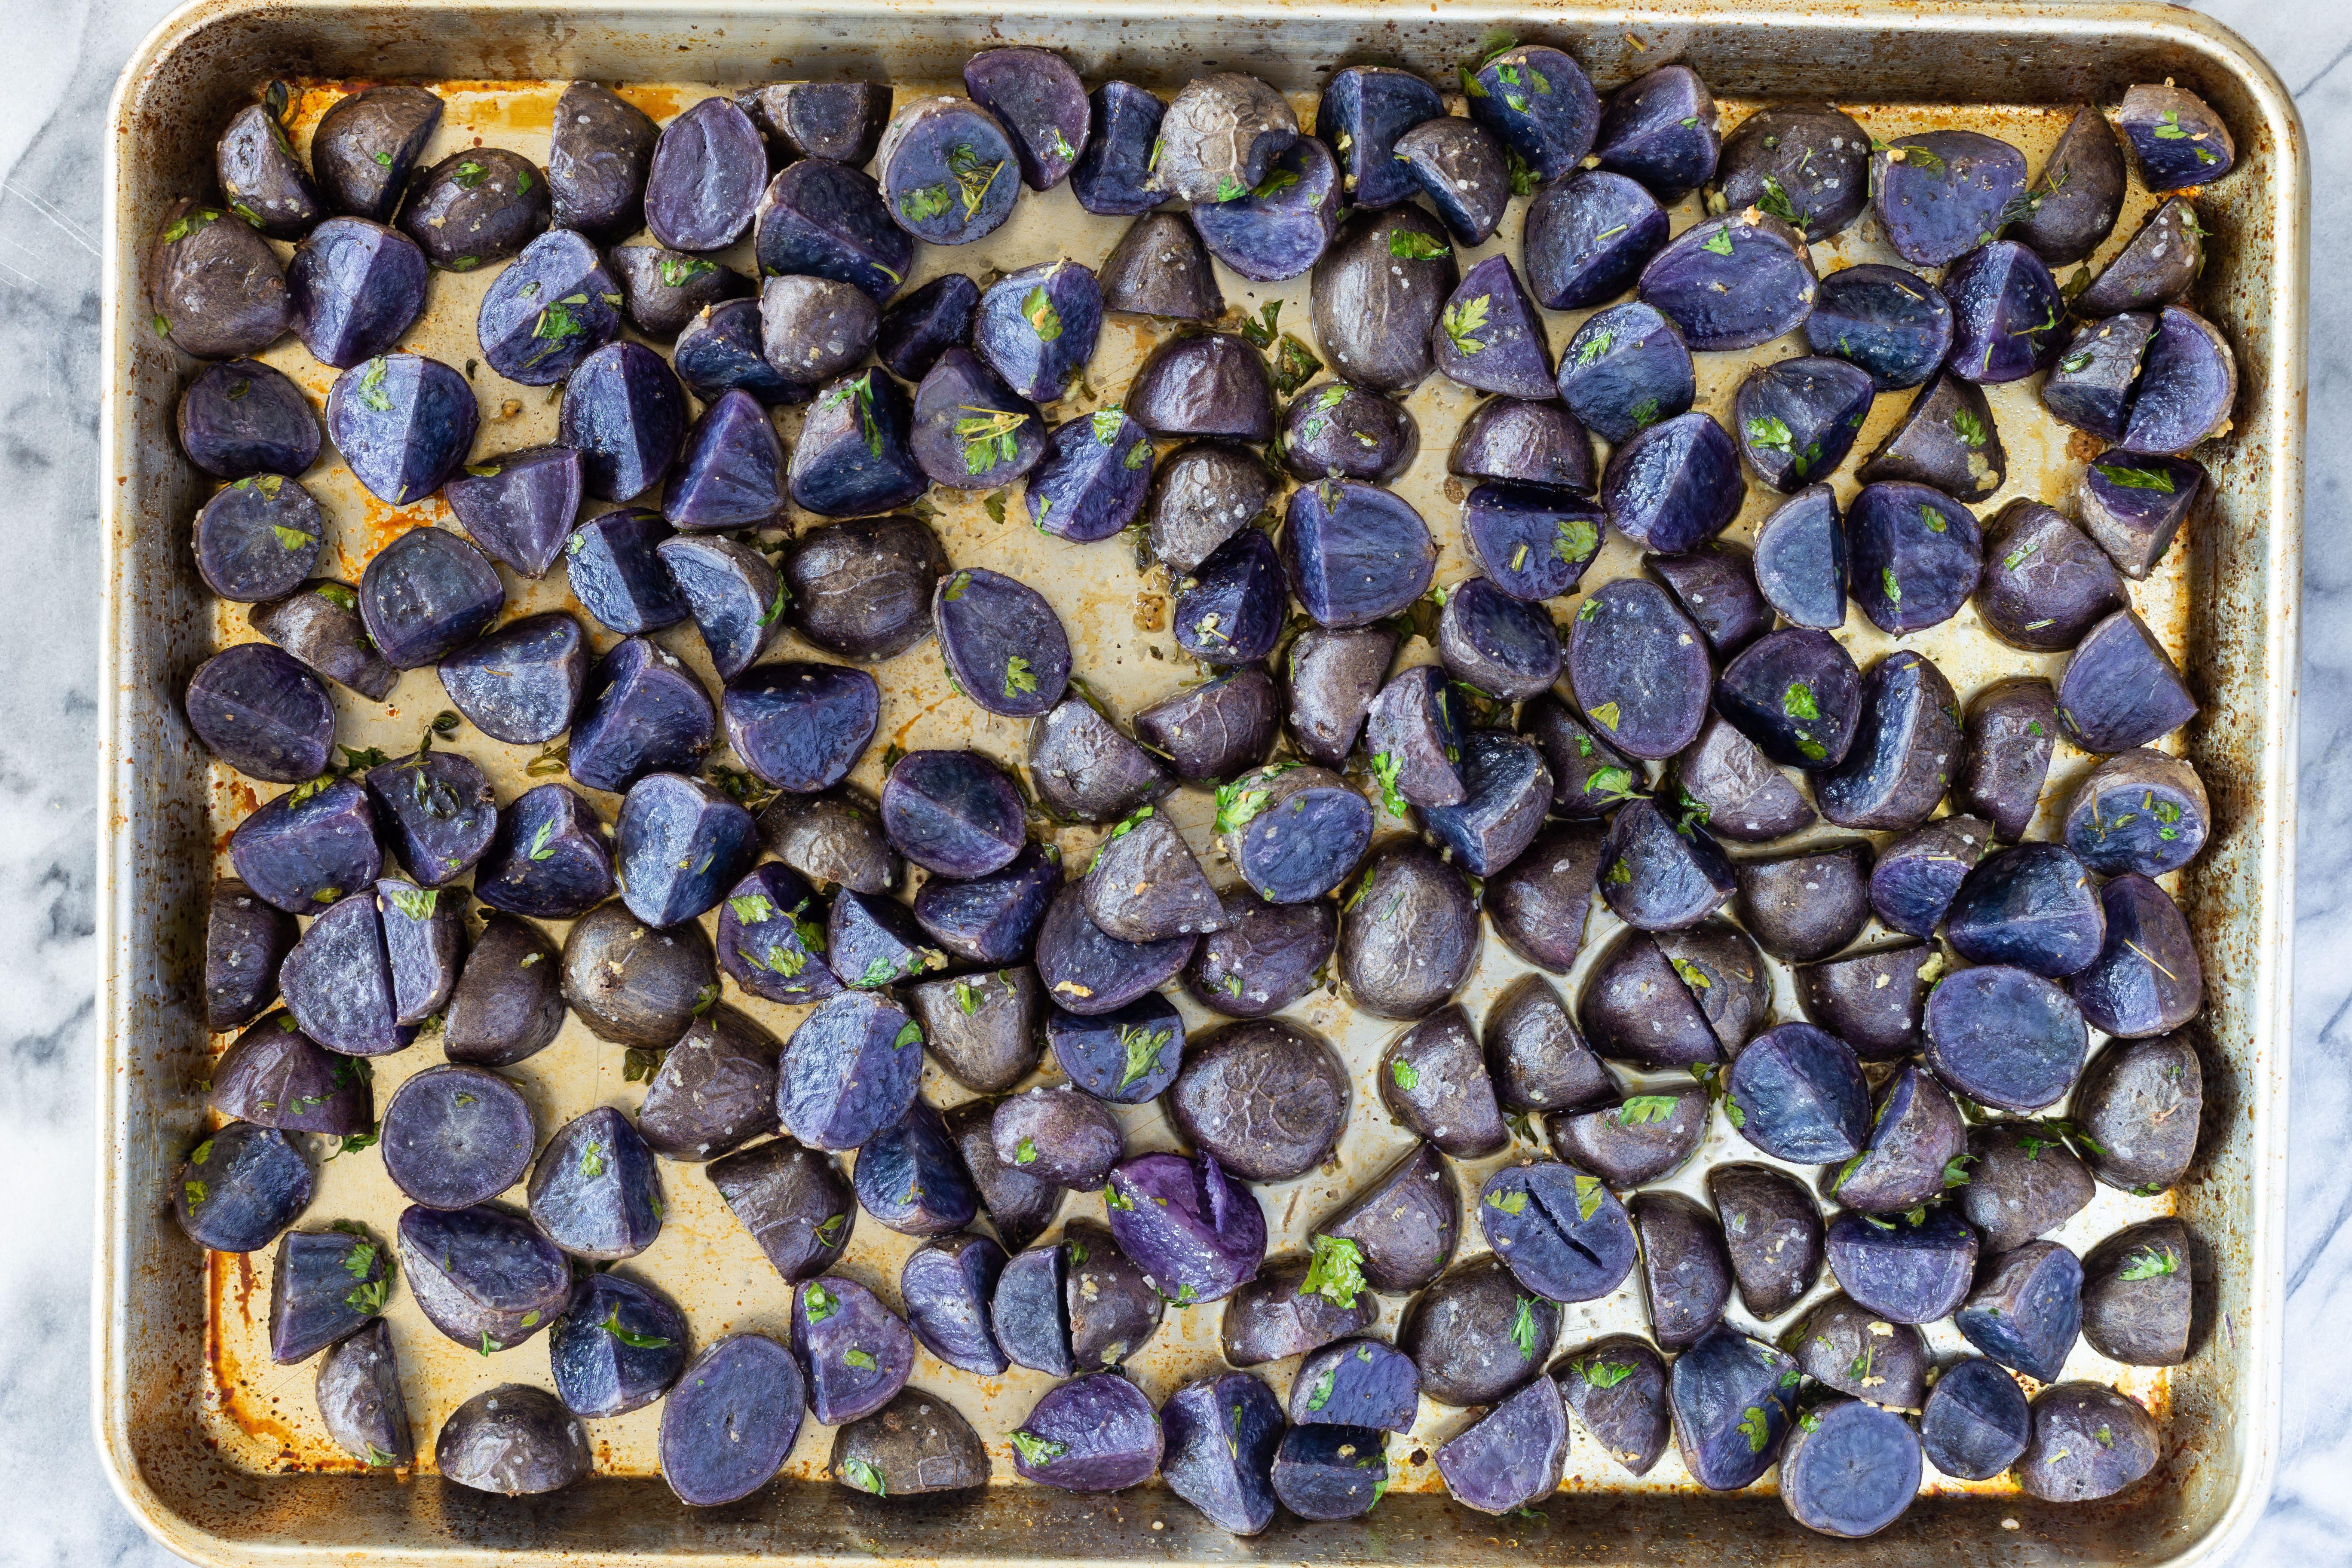 Roasted purple potatoes on baking pan